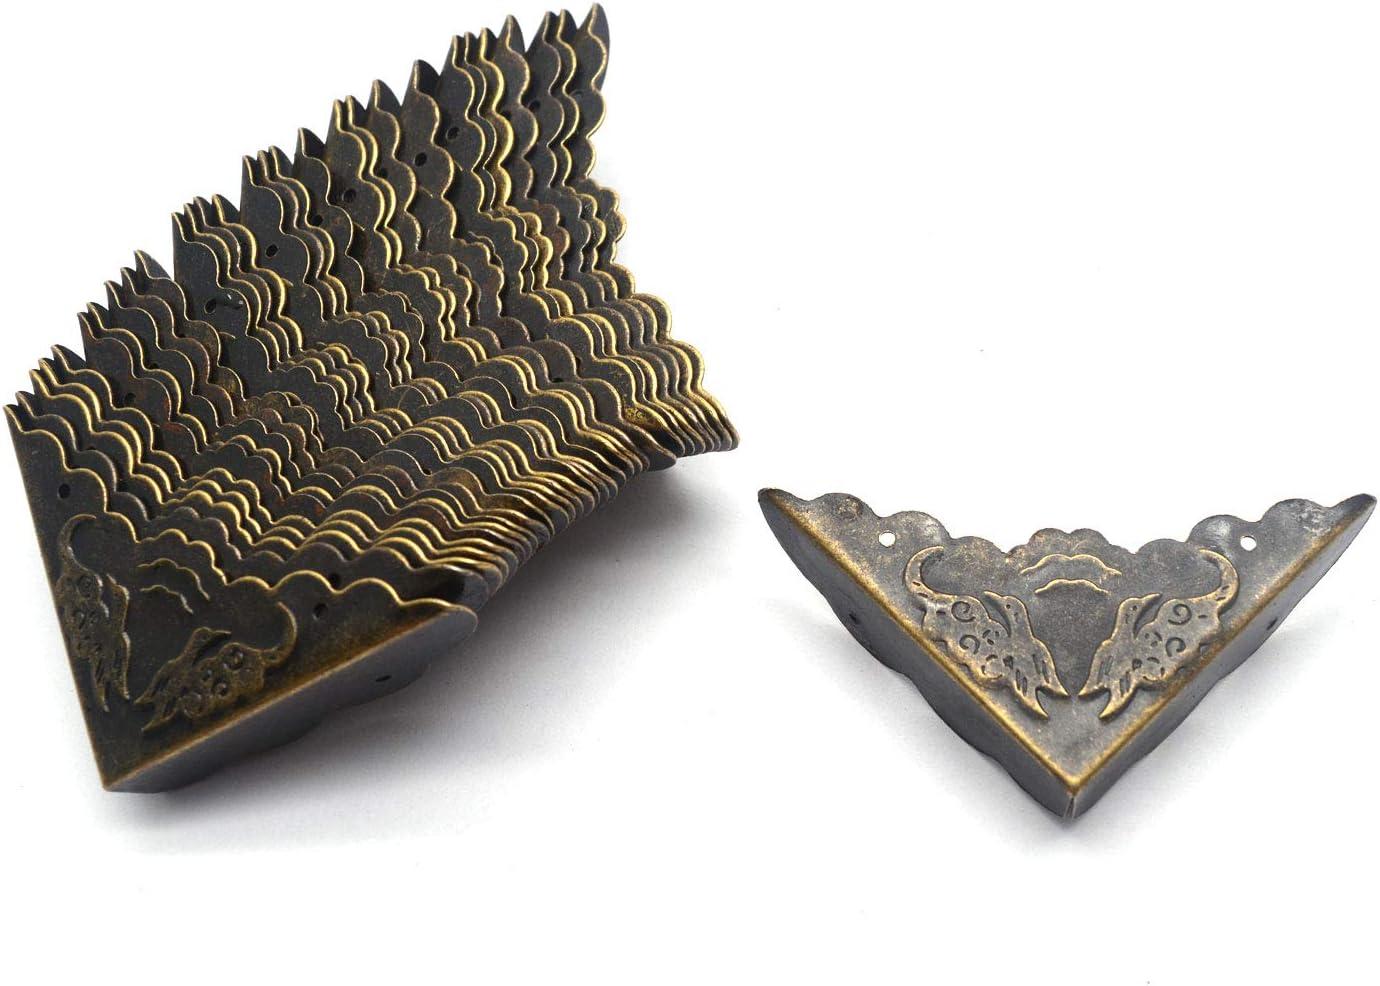 "Tulead 30PCS Box Corner Protectors Decorative Corner Antique Protector Bronze Corner Protector 1.7""x1.7""x0.4"" with Mounting Screws"